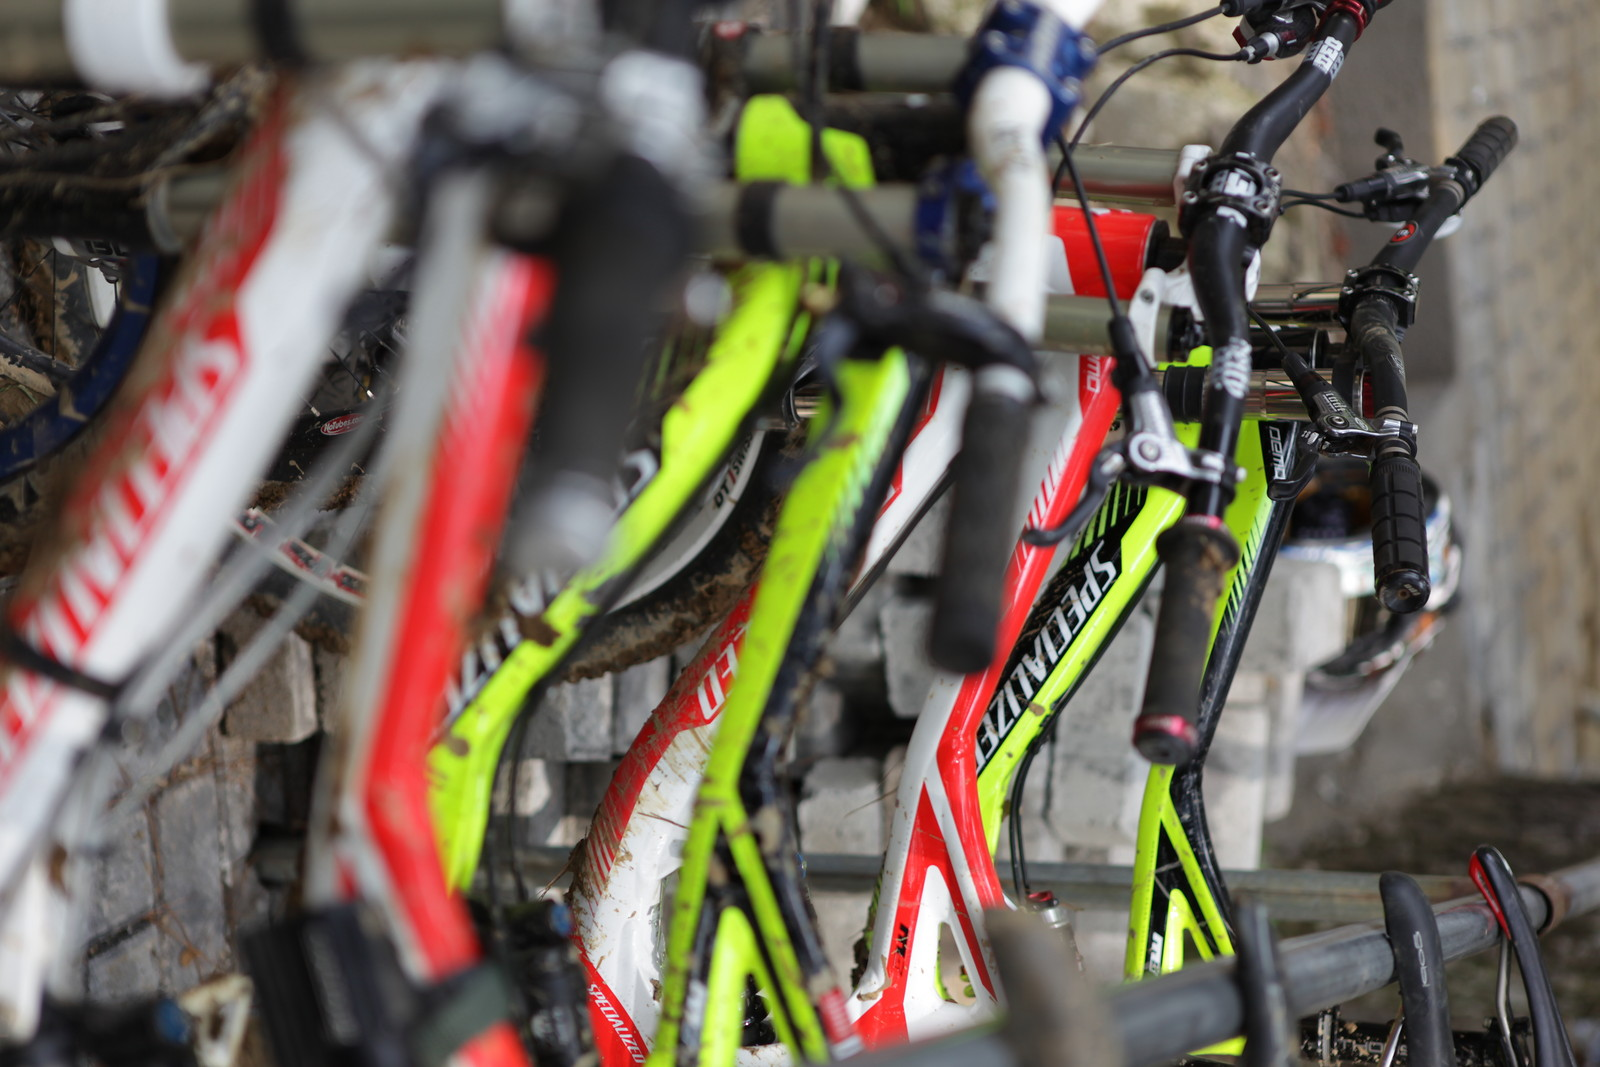 Demo-ed - Kooliner7 - Mountain Biking Pictures - Vital MTB